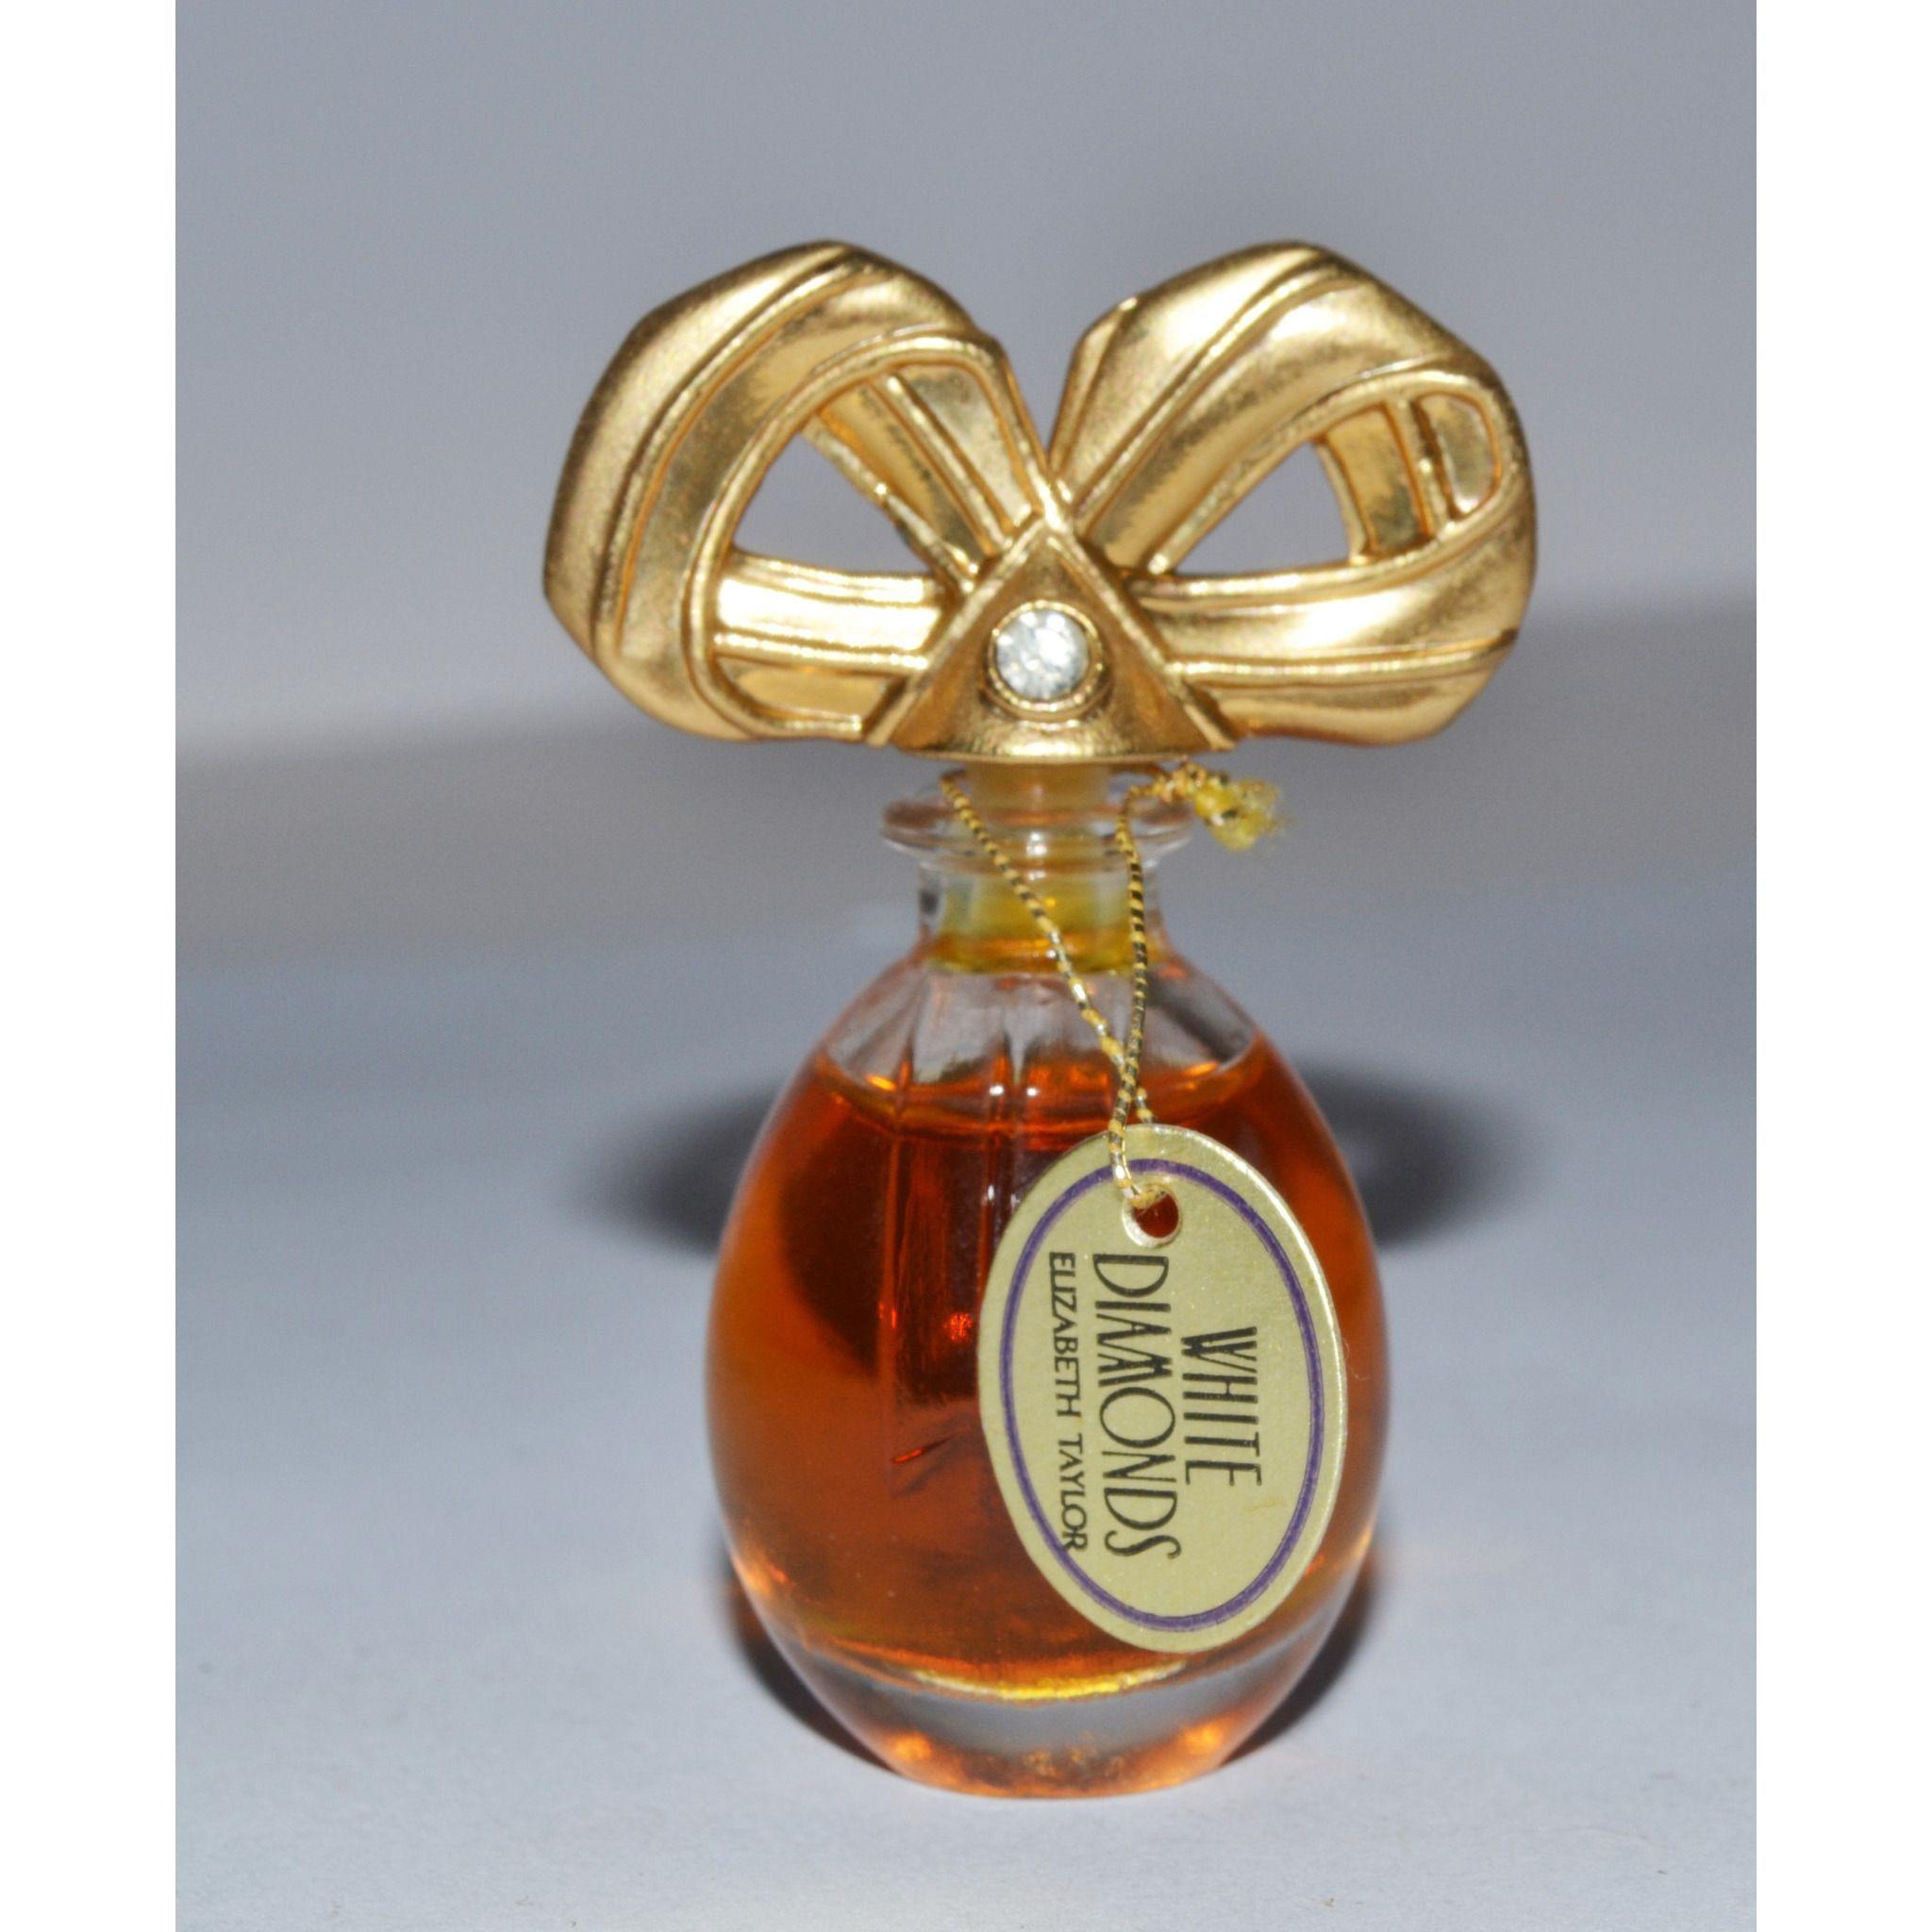 Vintage White Diamond Parfum By Elizabeth Taylor In 2020 Perfume Perfume Cologne Vintage Perfume